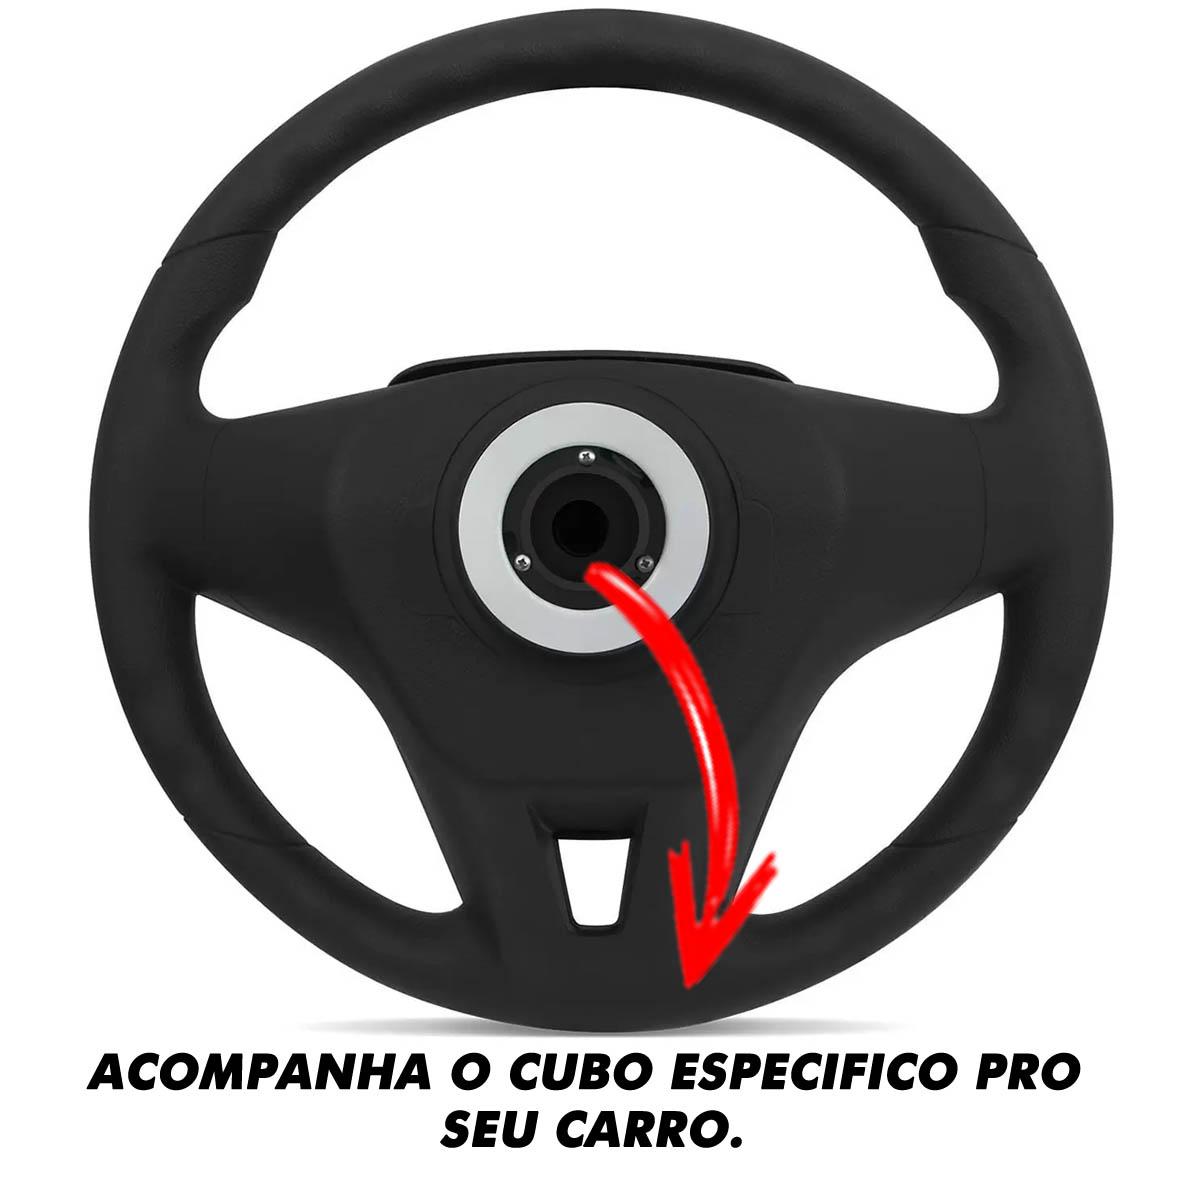 Volante Chevrolet de Cruze Esportivo Cubo S10 Blazer Silverado 1995 a 2013 Opala Chevette 1968 a 1998 Poliparts